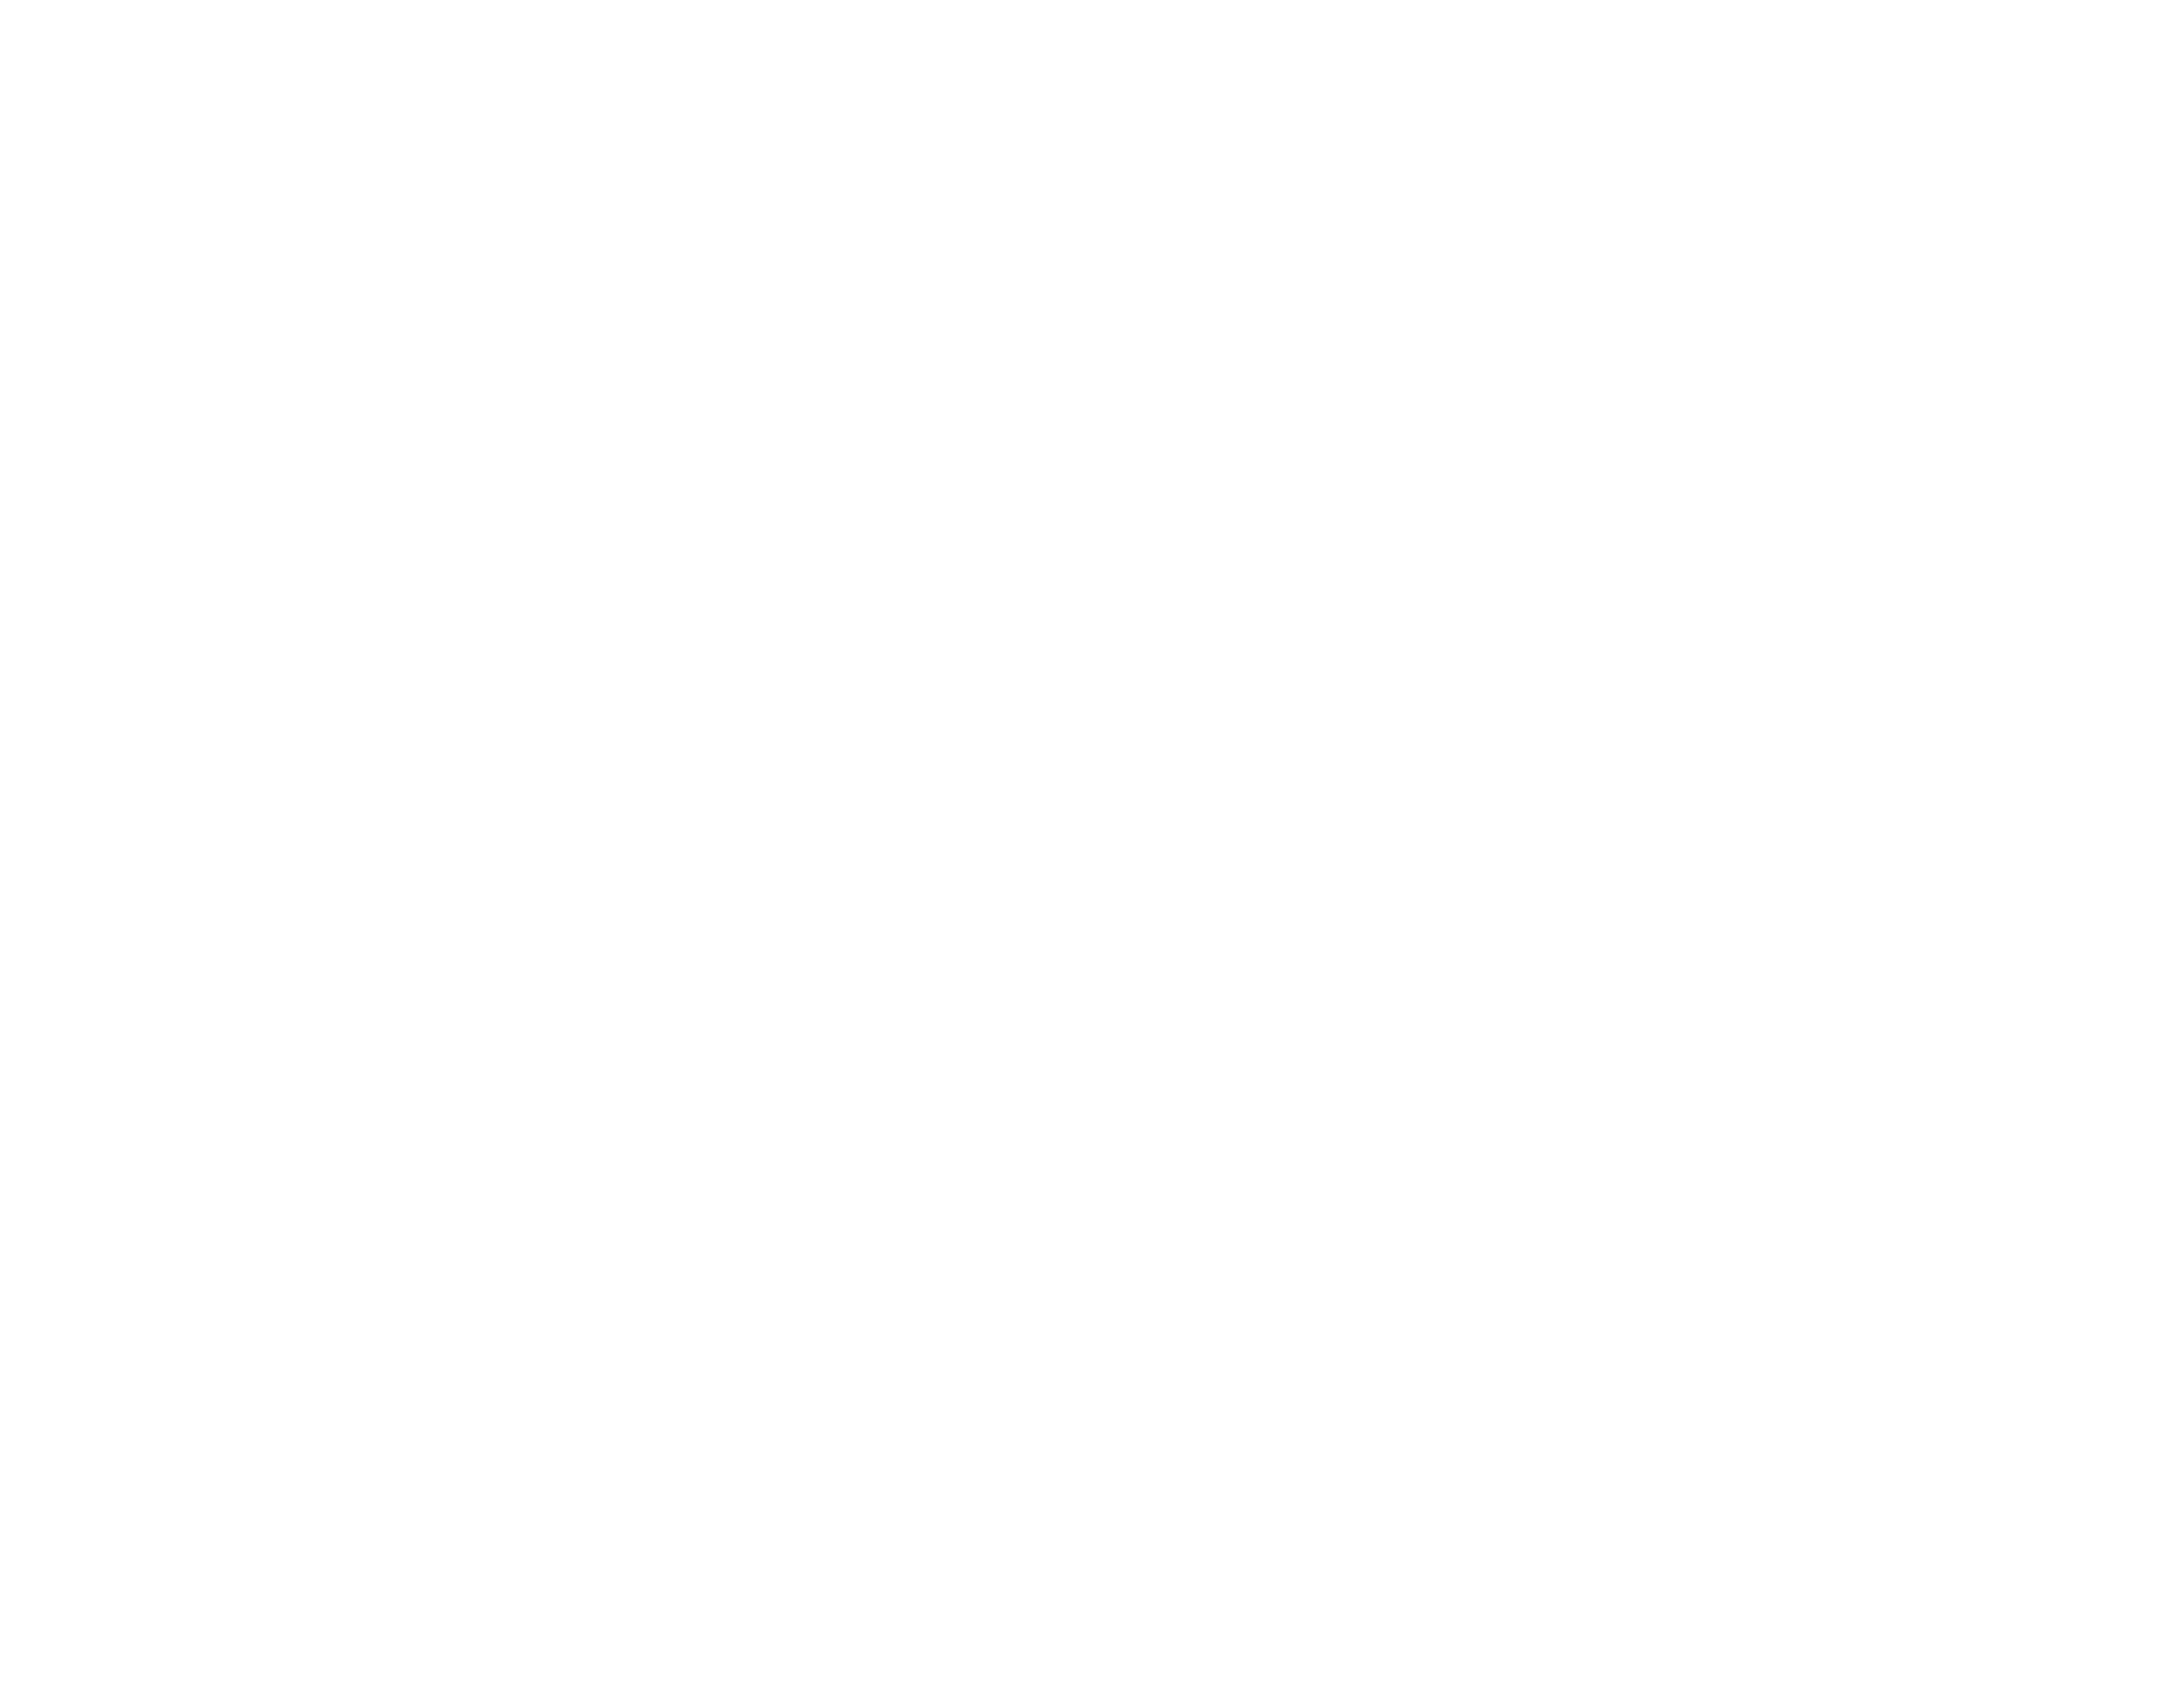 BiscariniMilano Logo